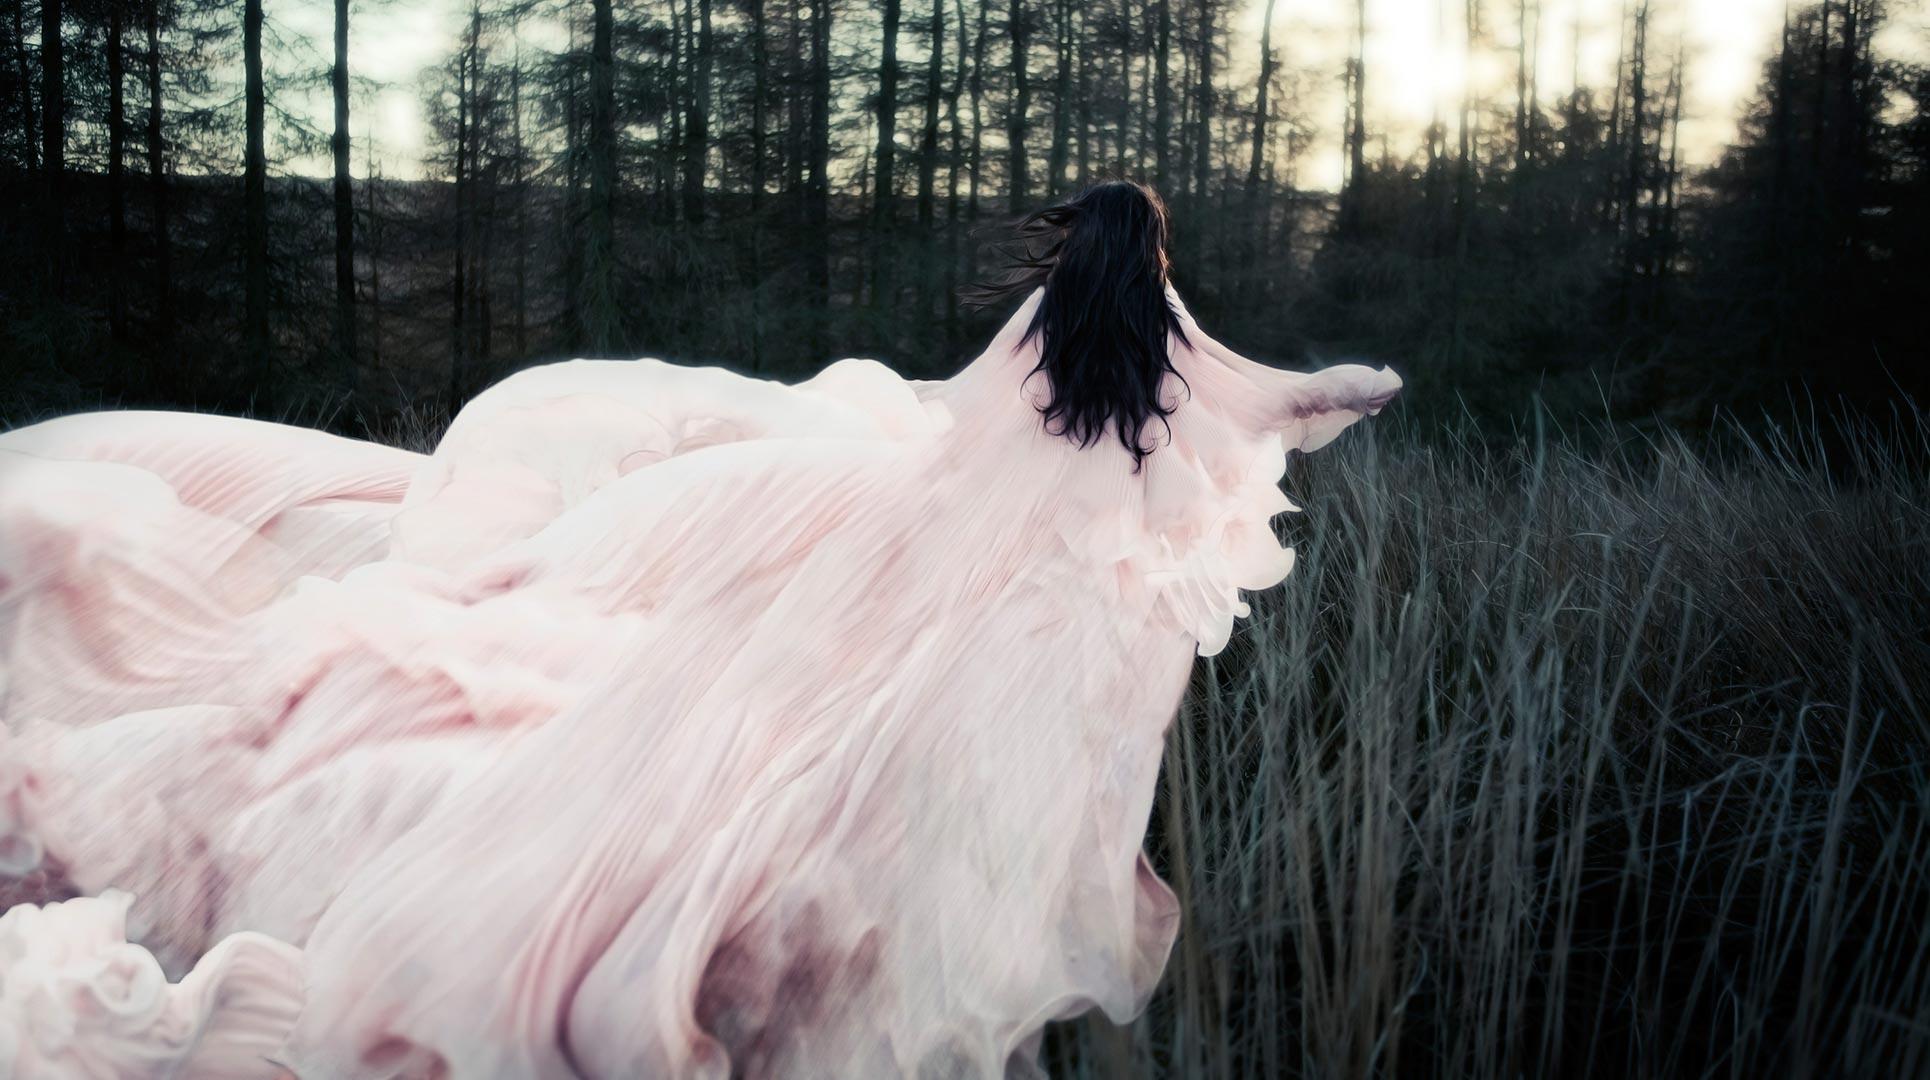 Nicola_Taylor_Art_Photography_Evensong_1